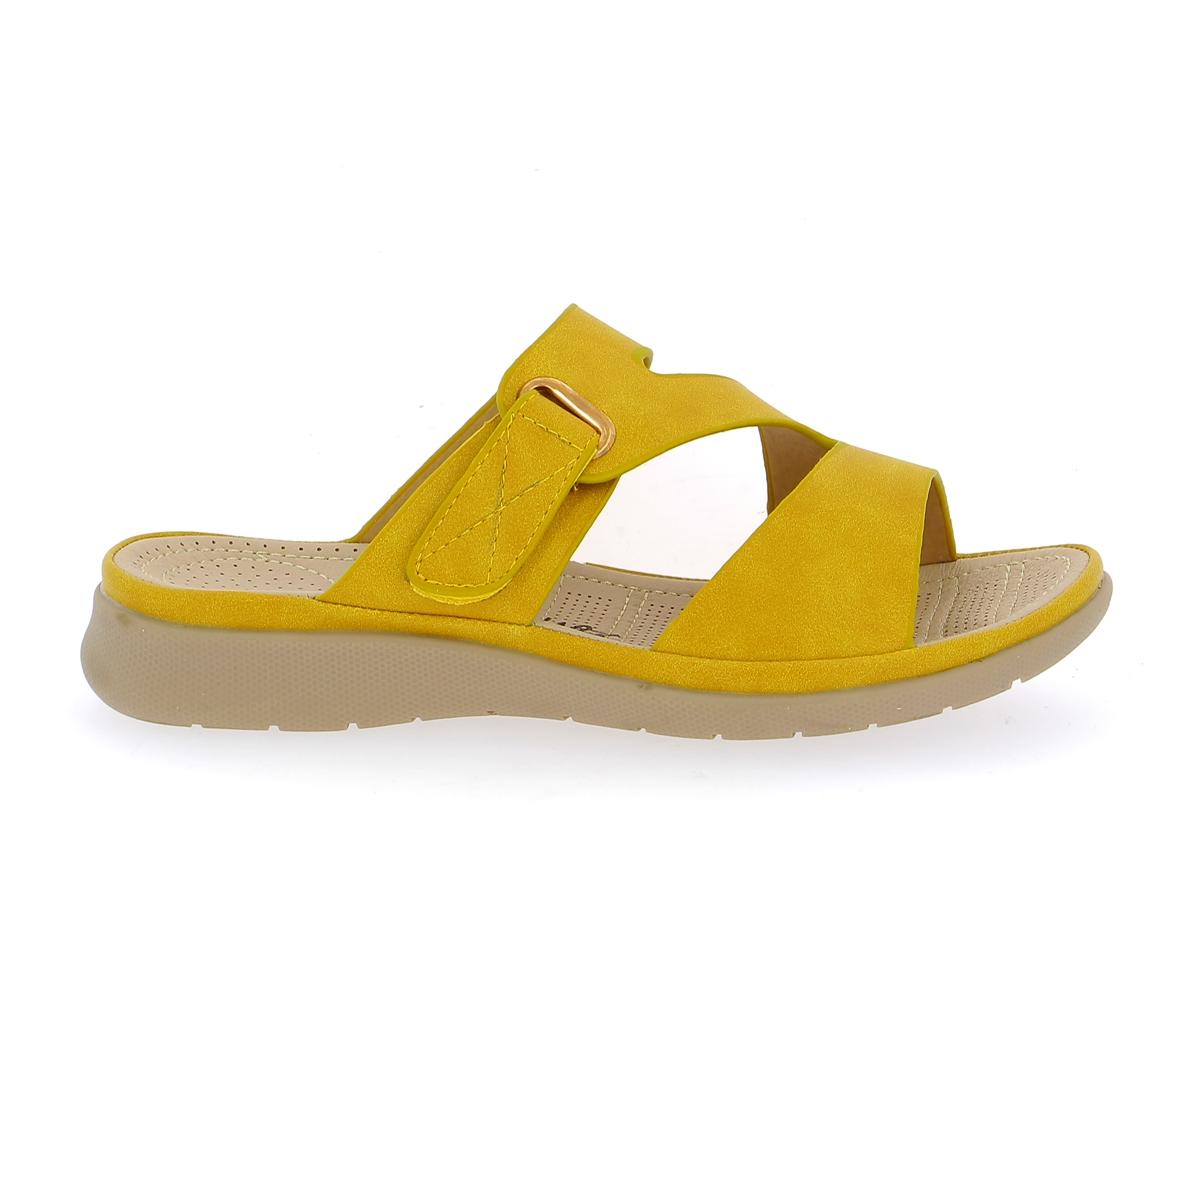 Cypres Muiltjes - slippers geel